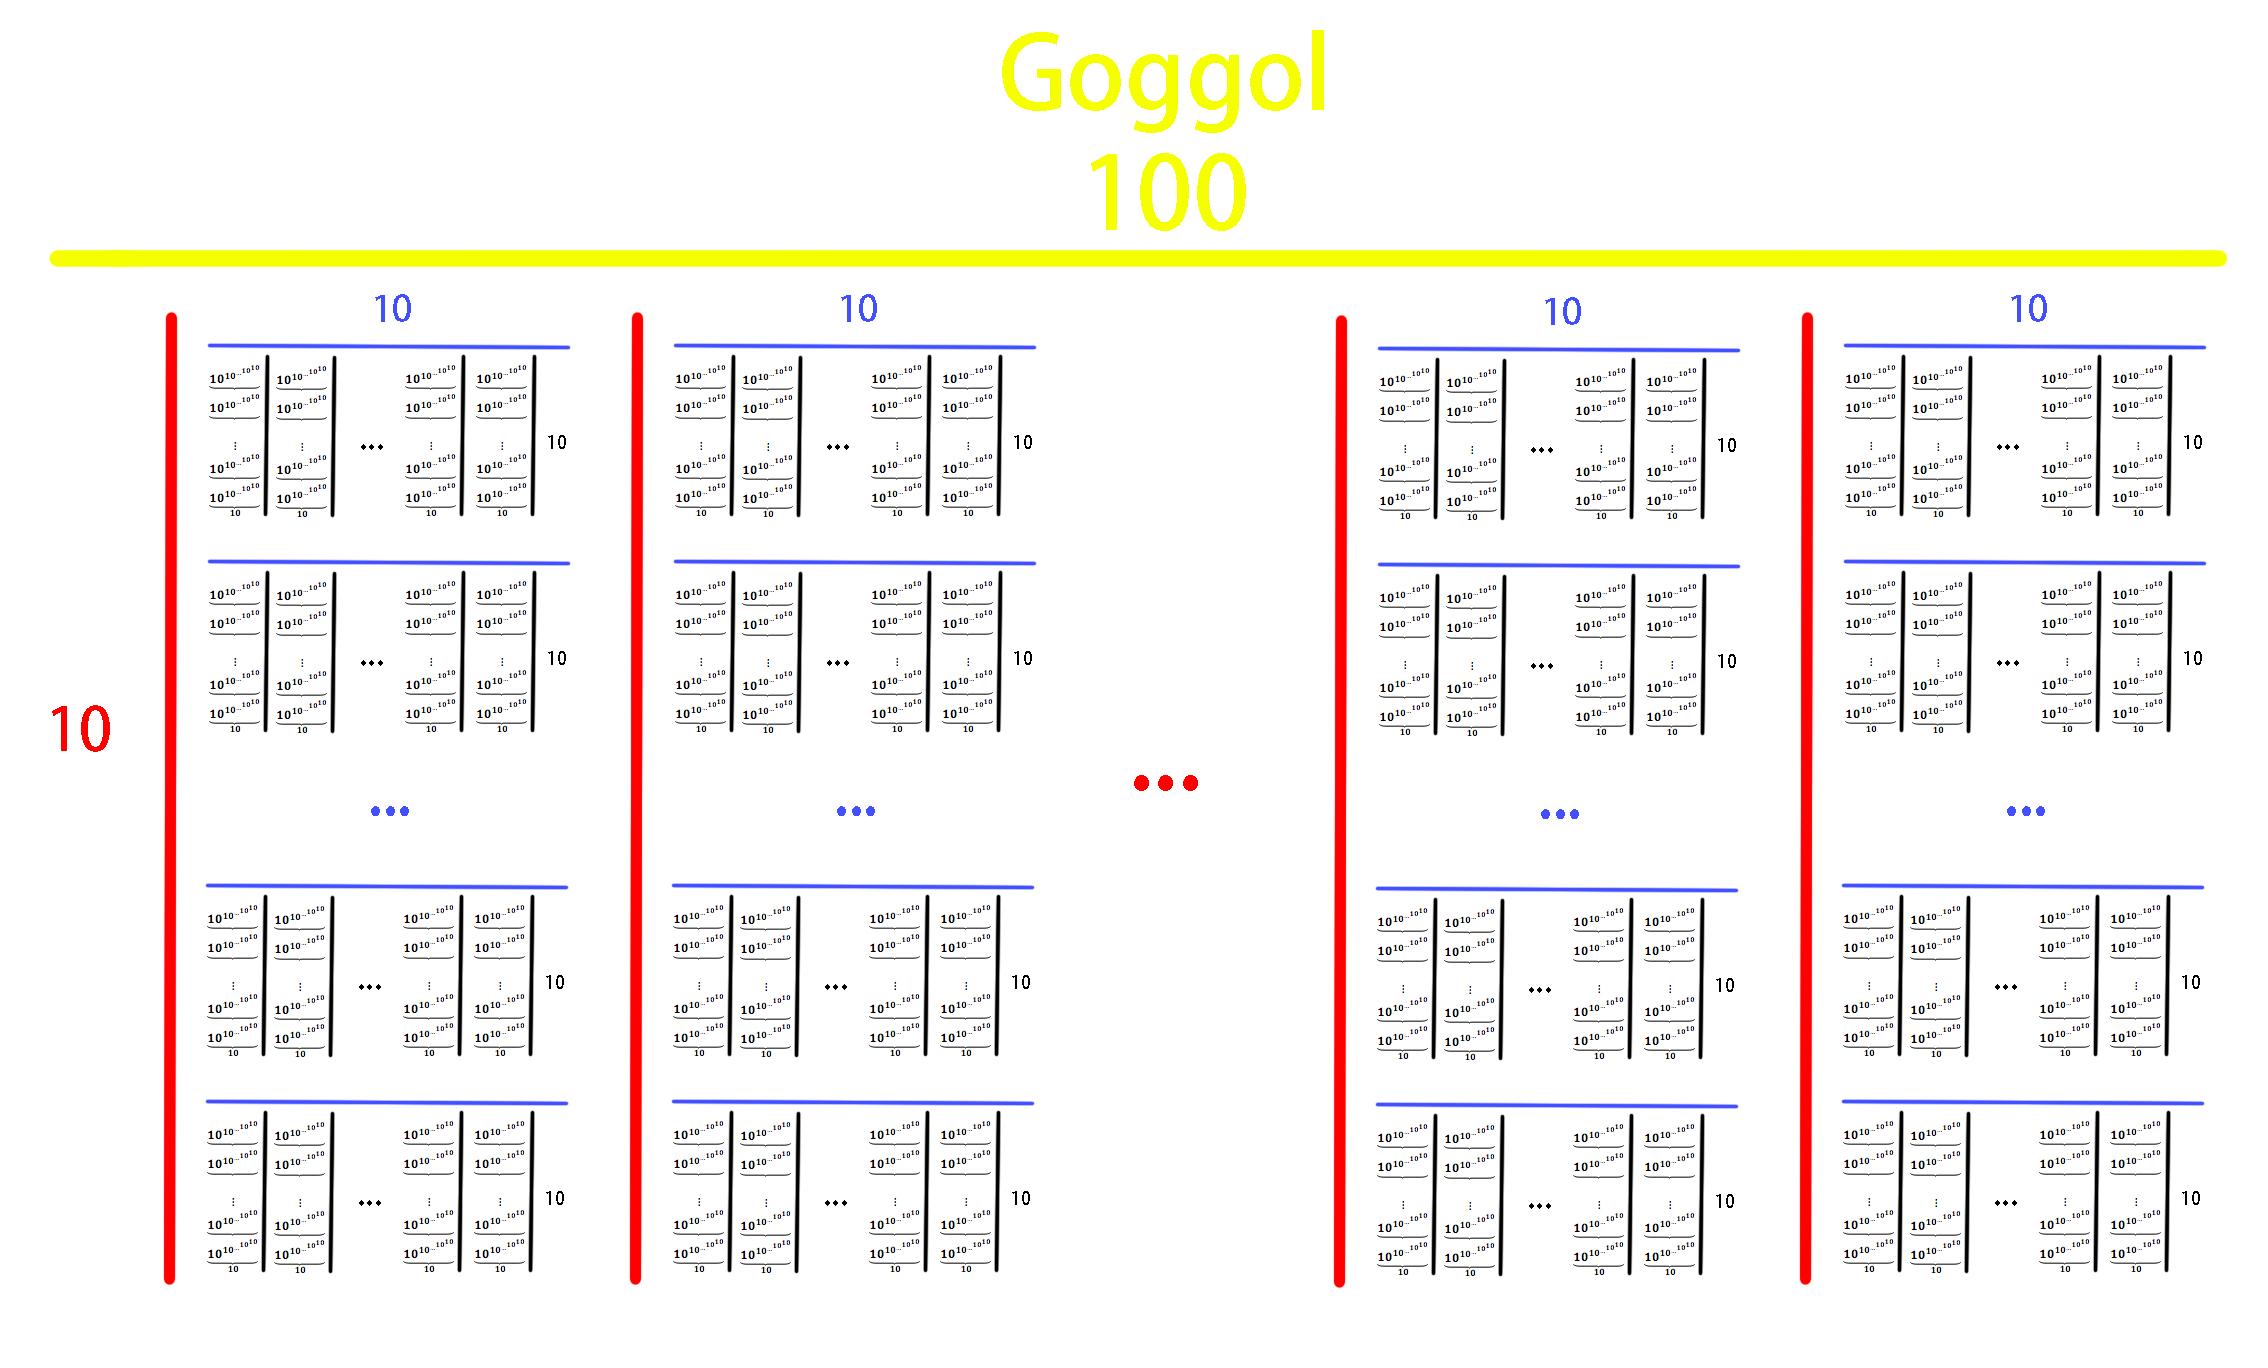 Goggol